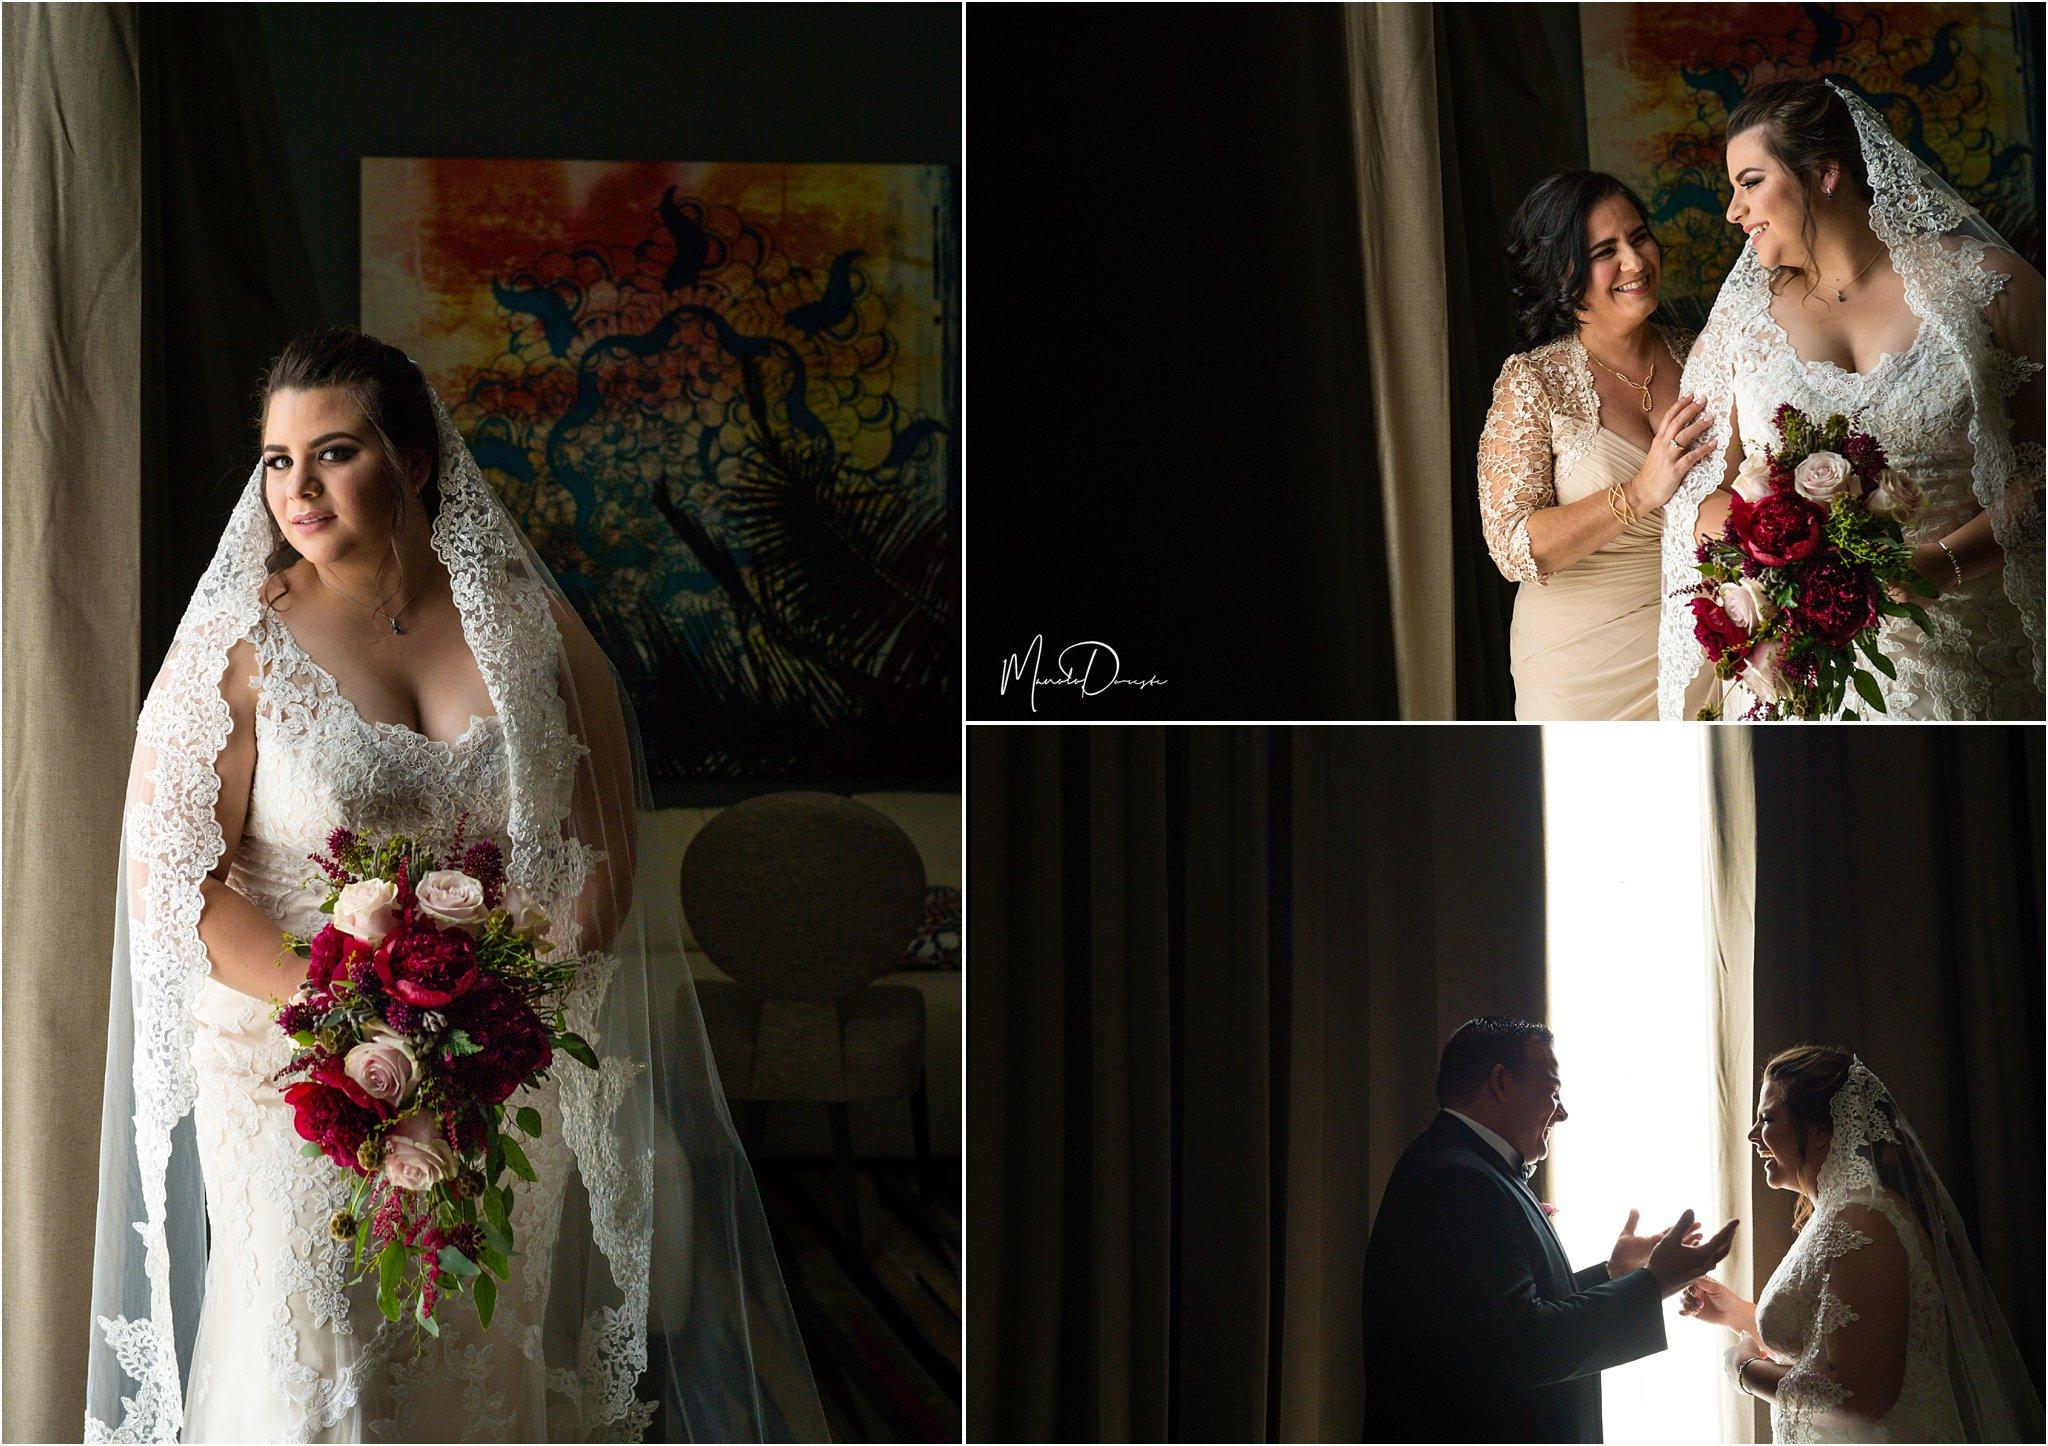 0360_ManoloDoreste_InFocusStudios_Wedding_Family_Photography_Miami_MiamiPhotographer.jpg